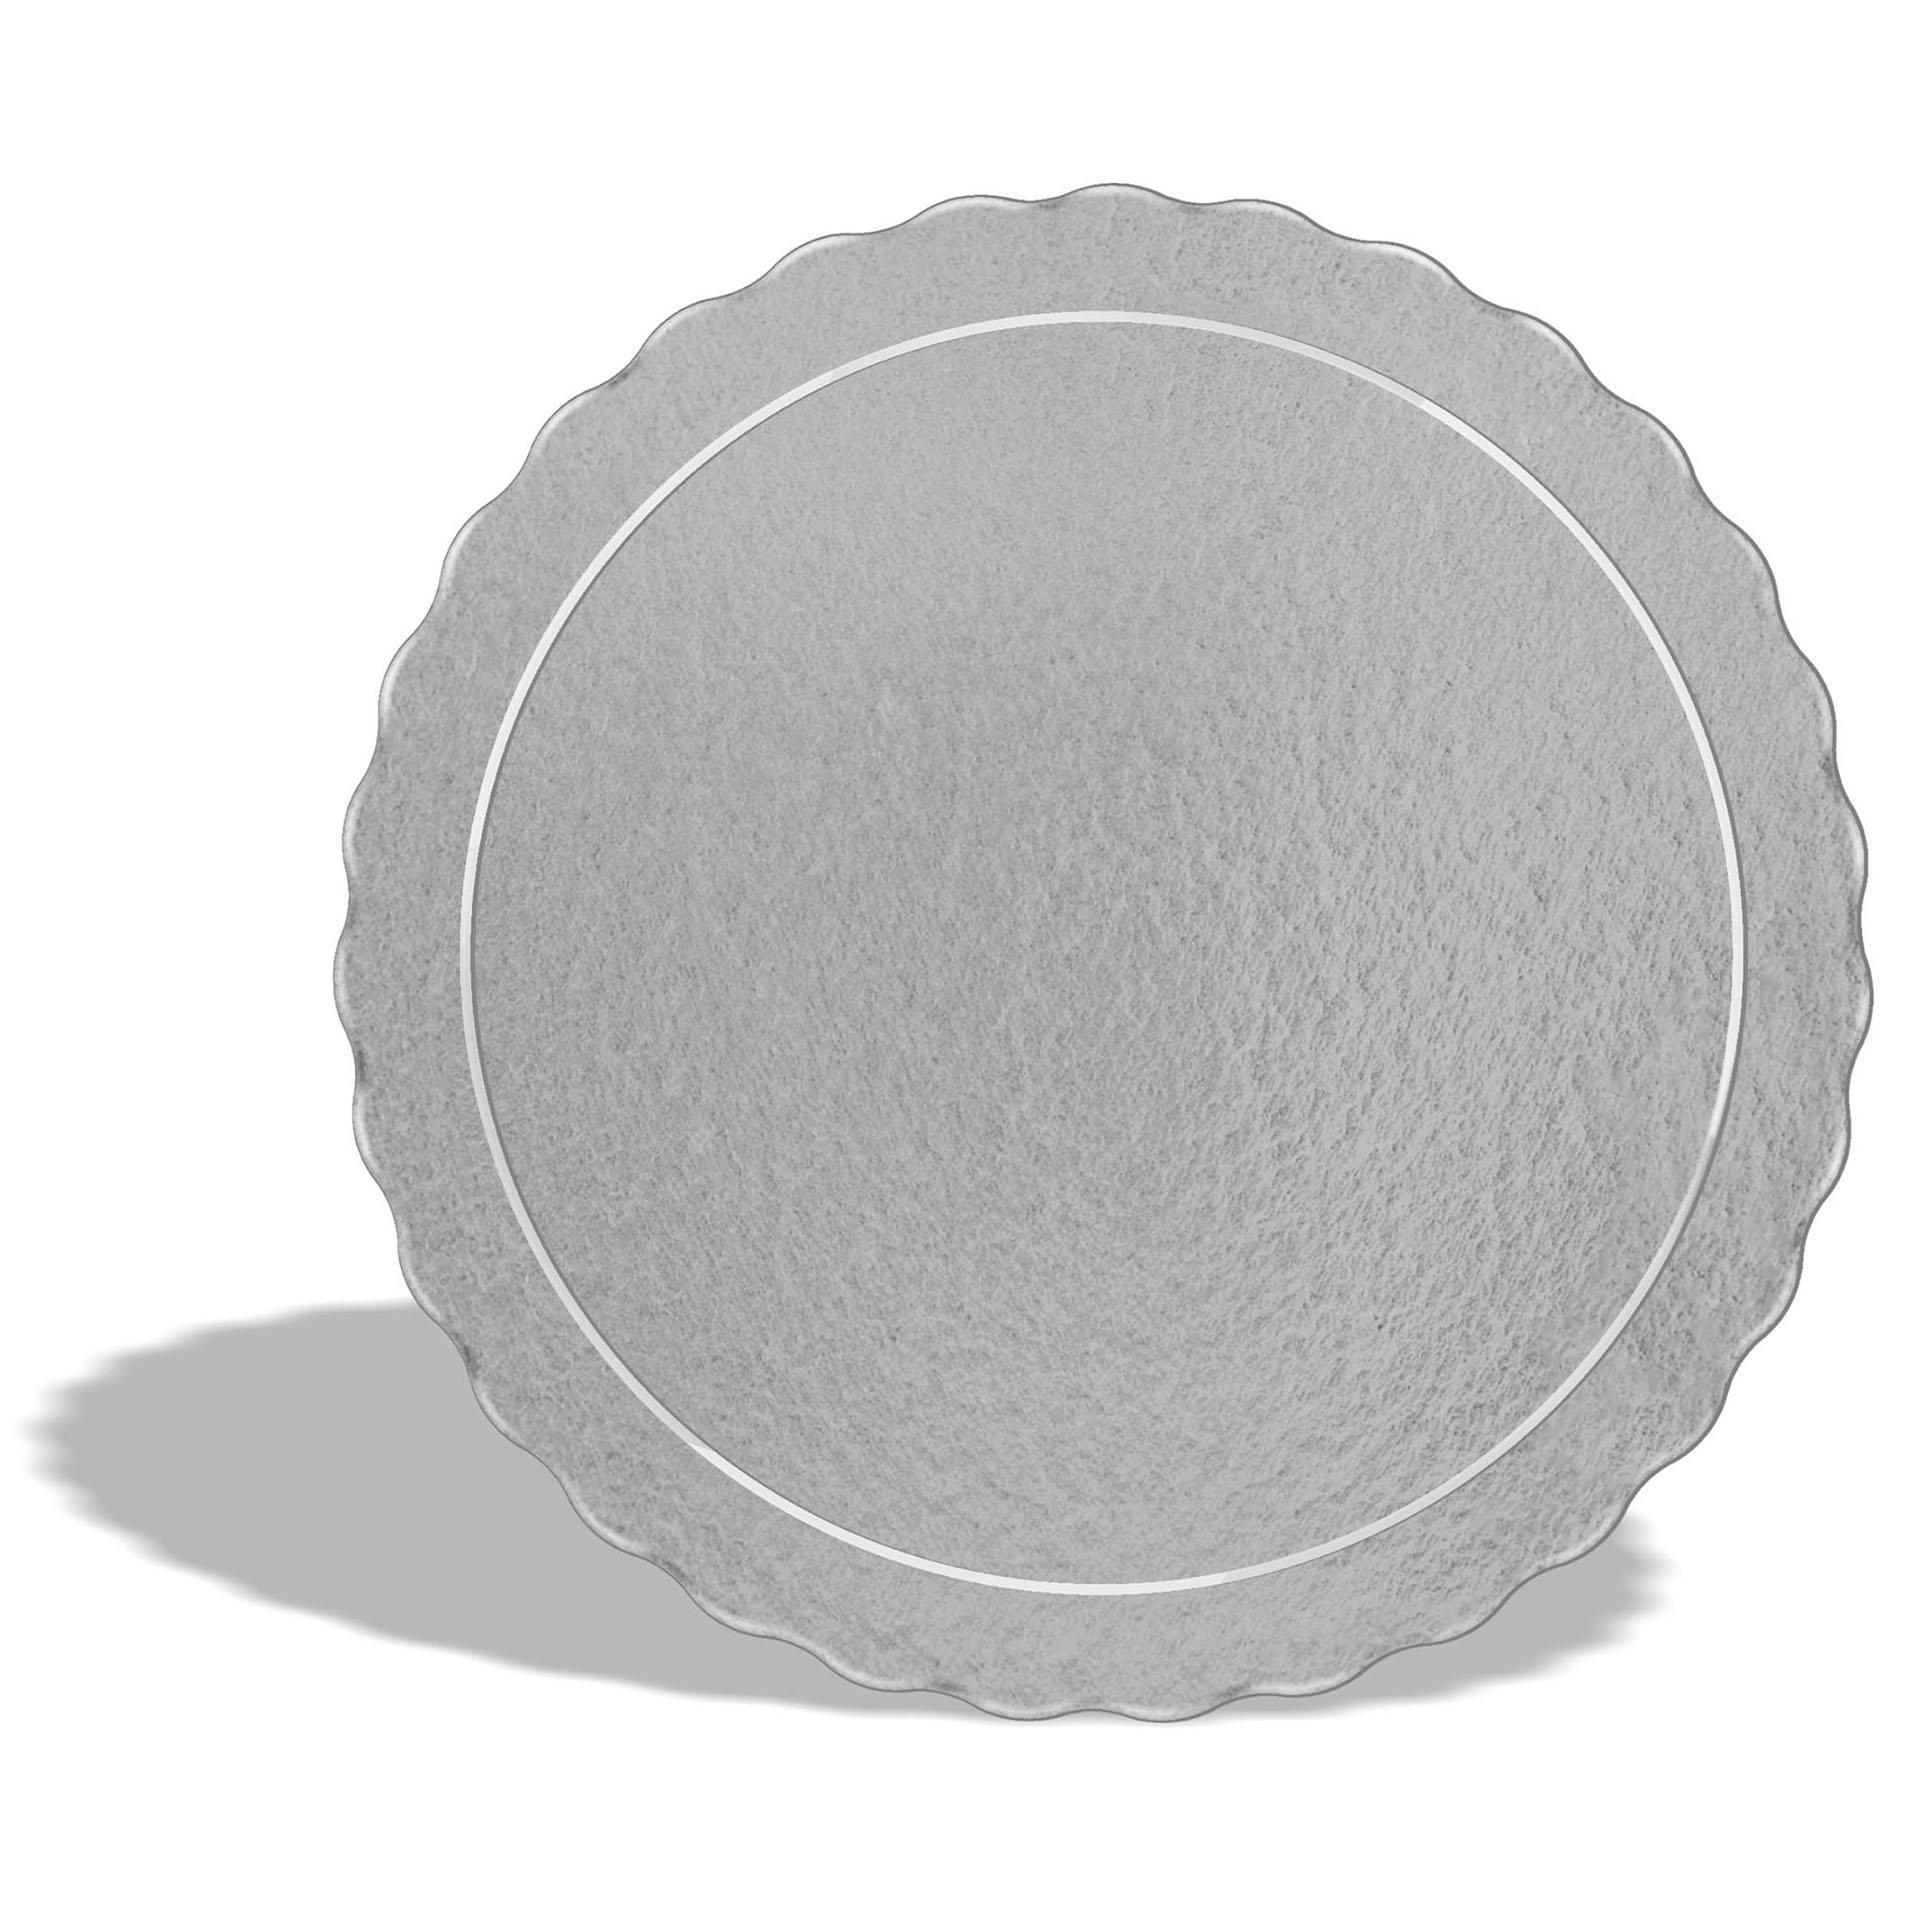 Kit 60 Bases Laminadas Para Bolo, Cake Board, 25, 30 e 35cm - Prata